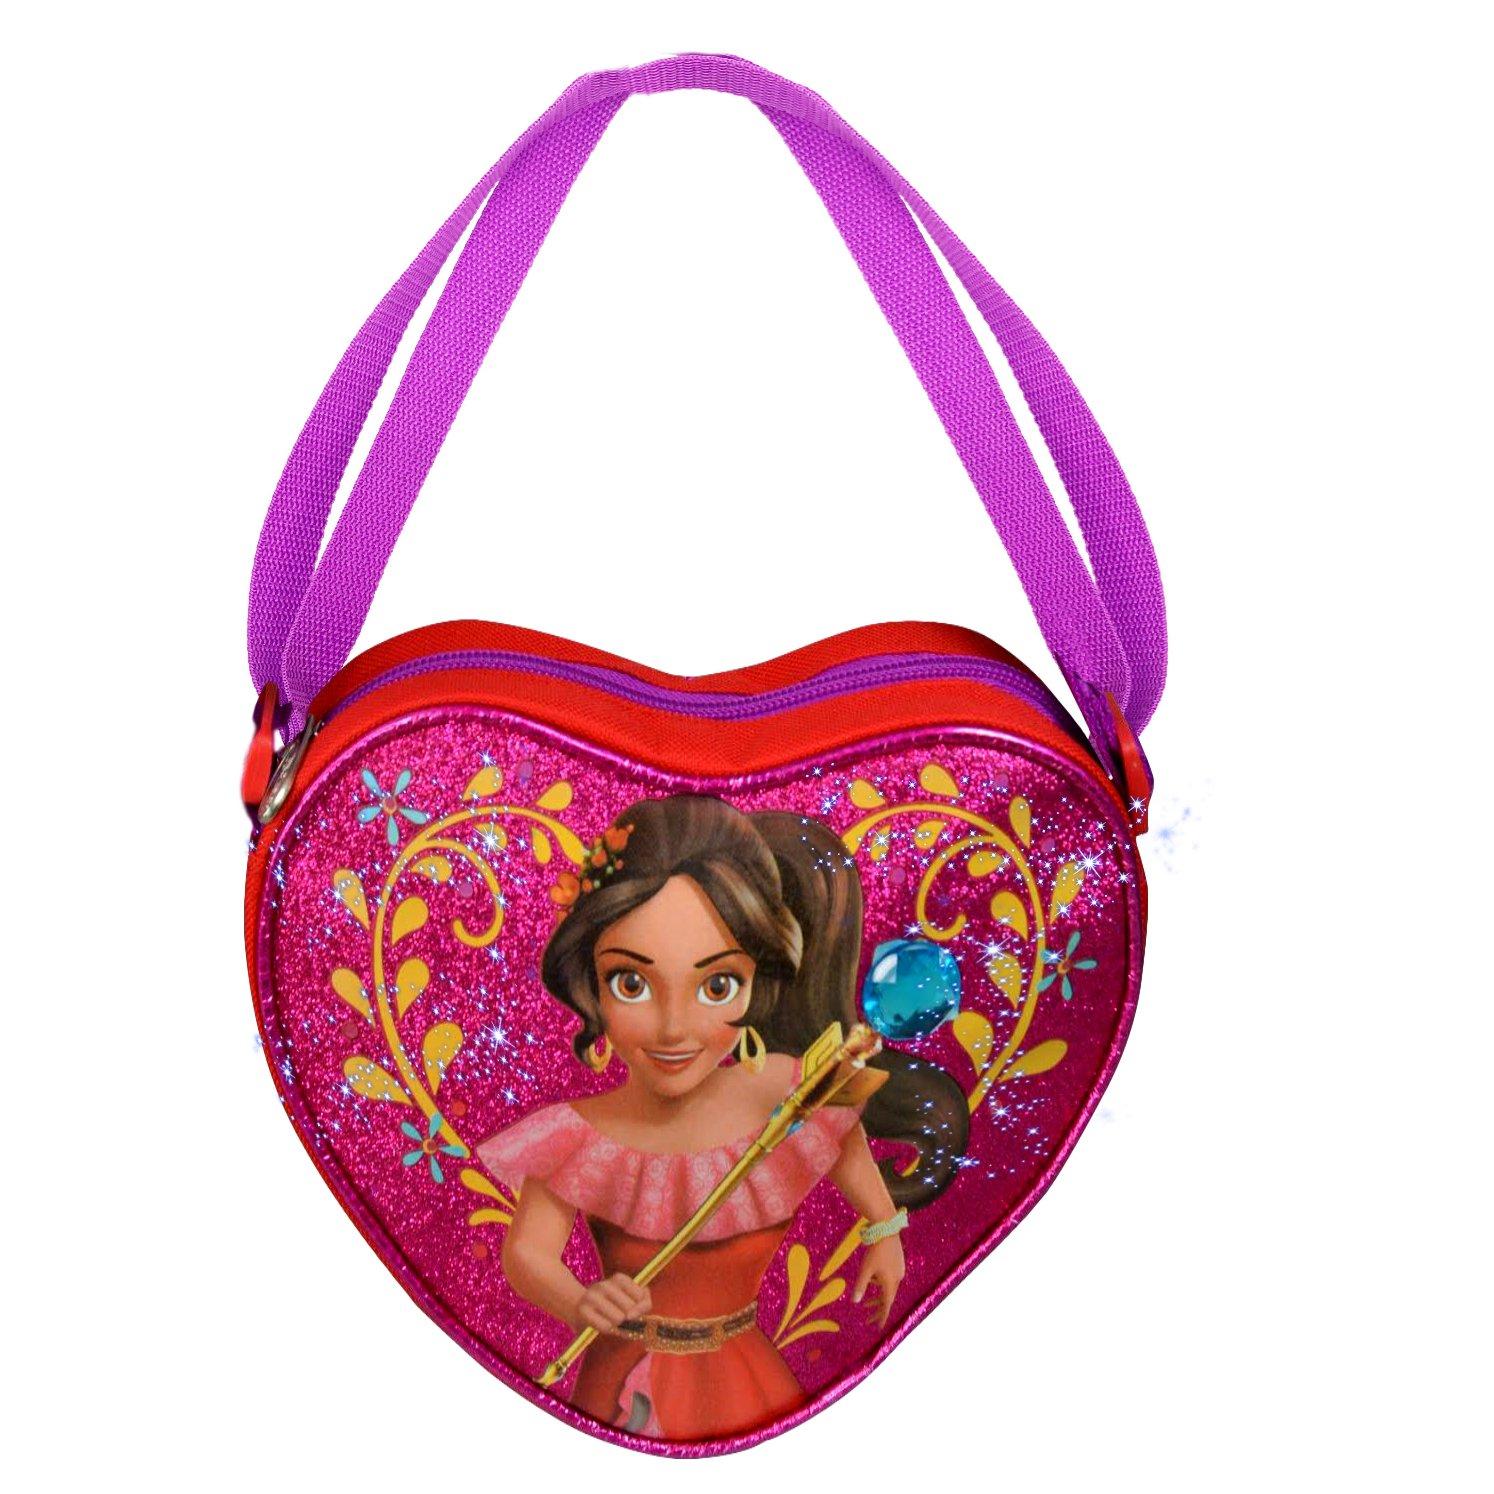 Disney Toddler Preschool Purse Handbag